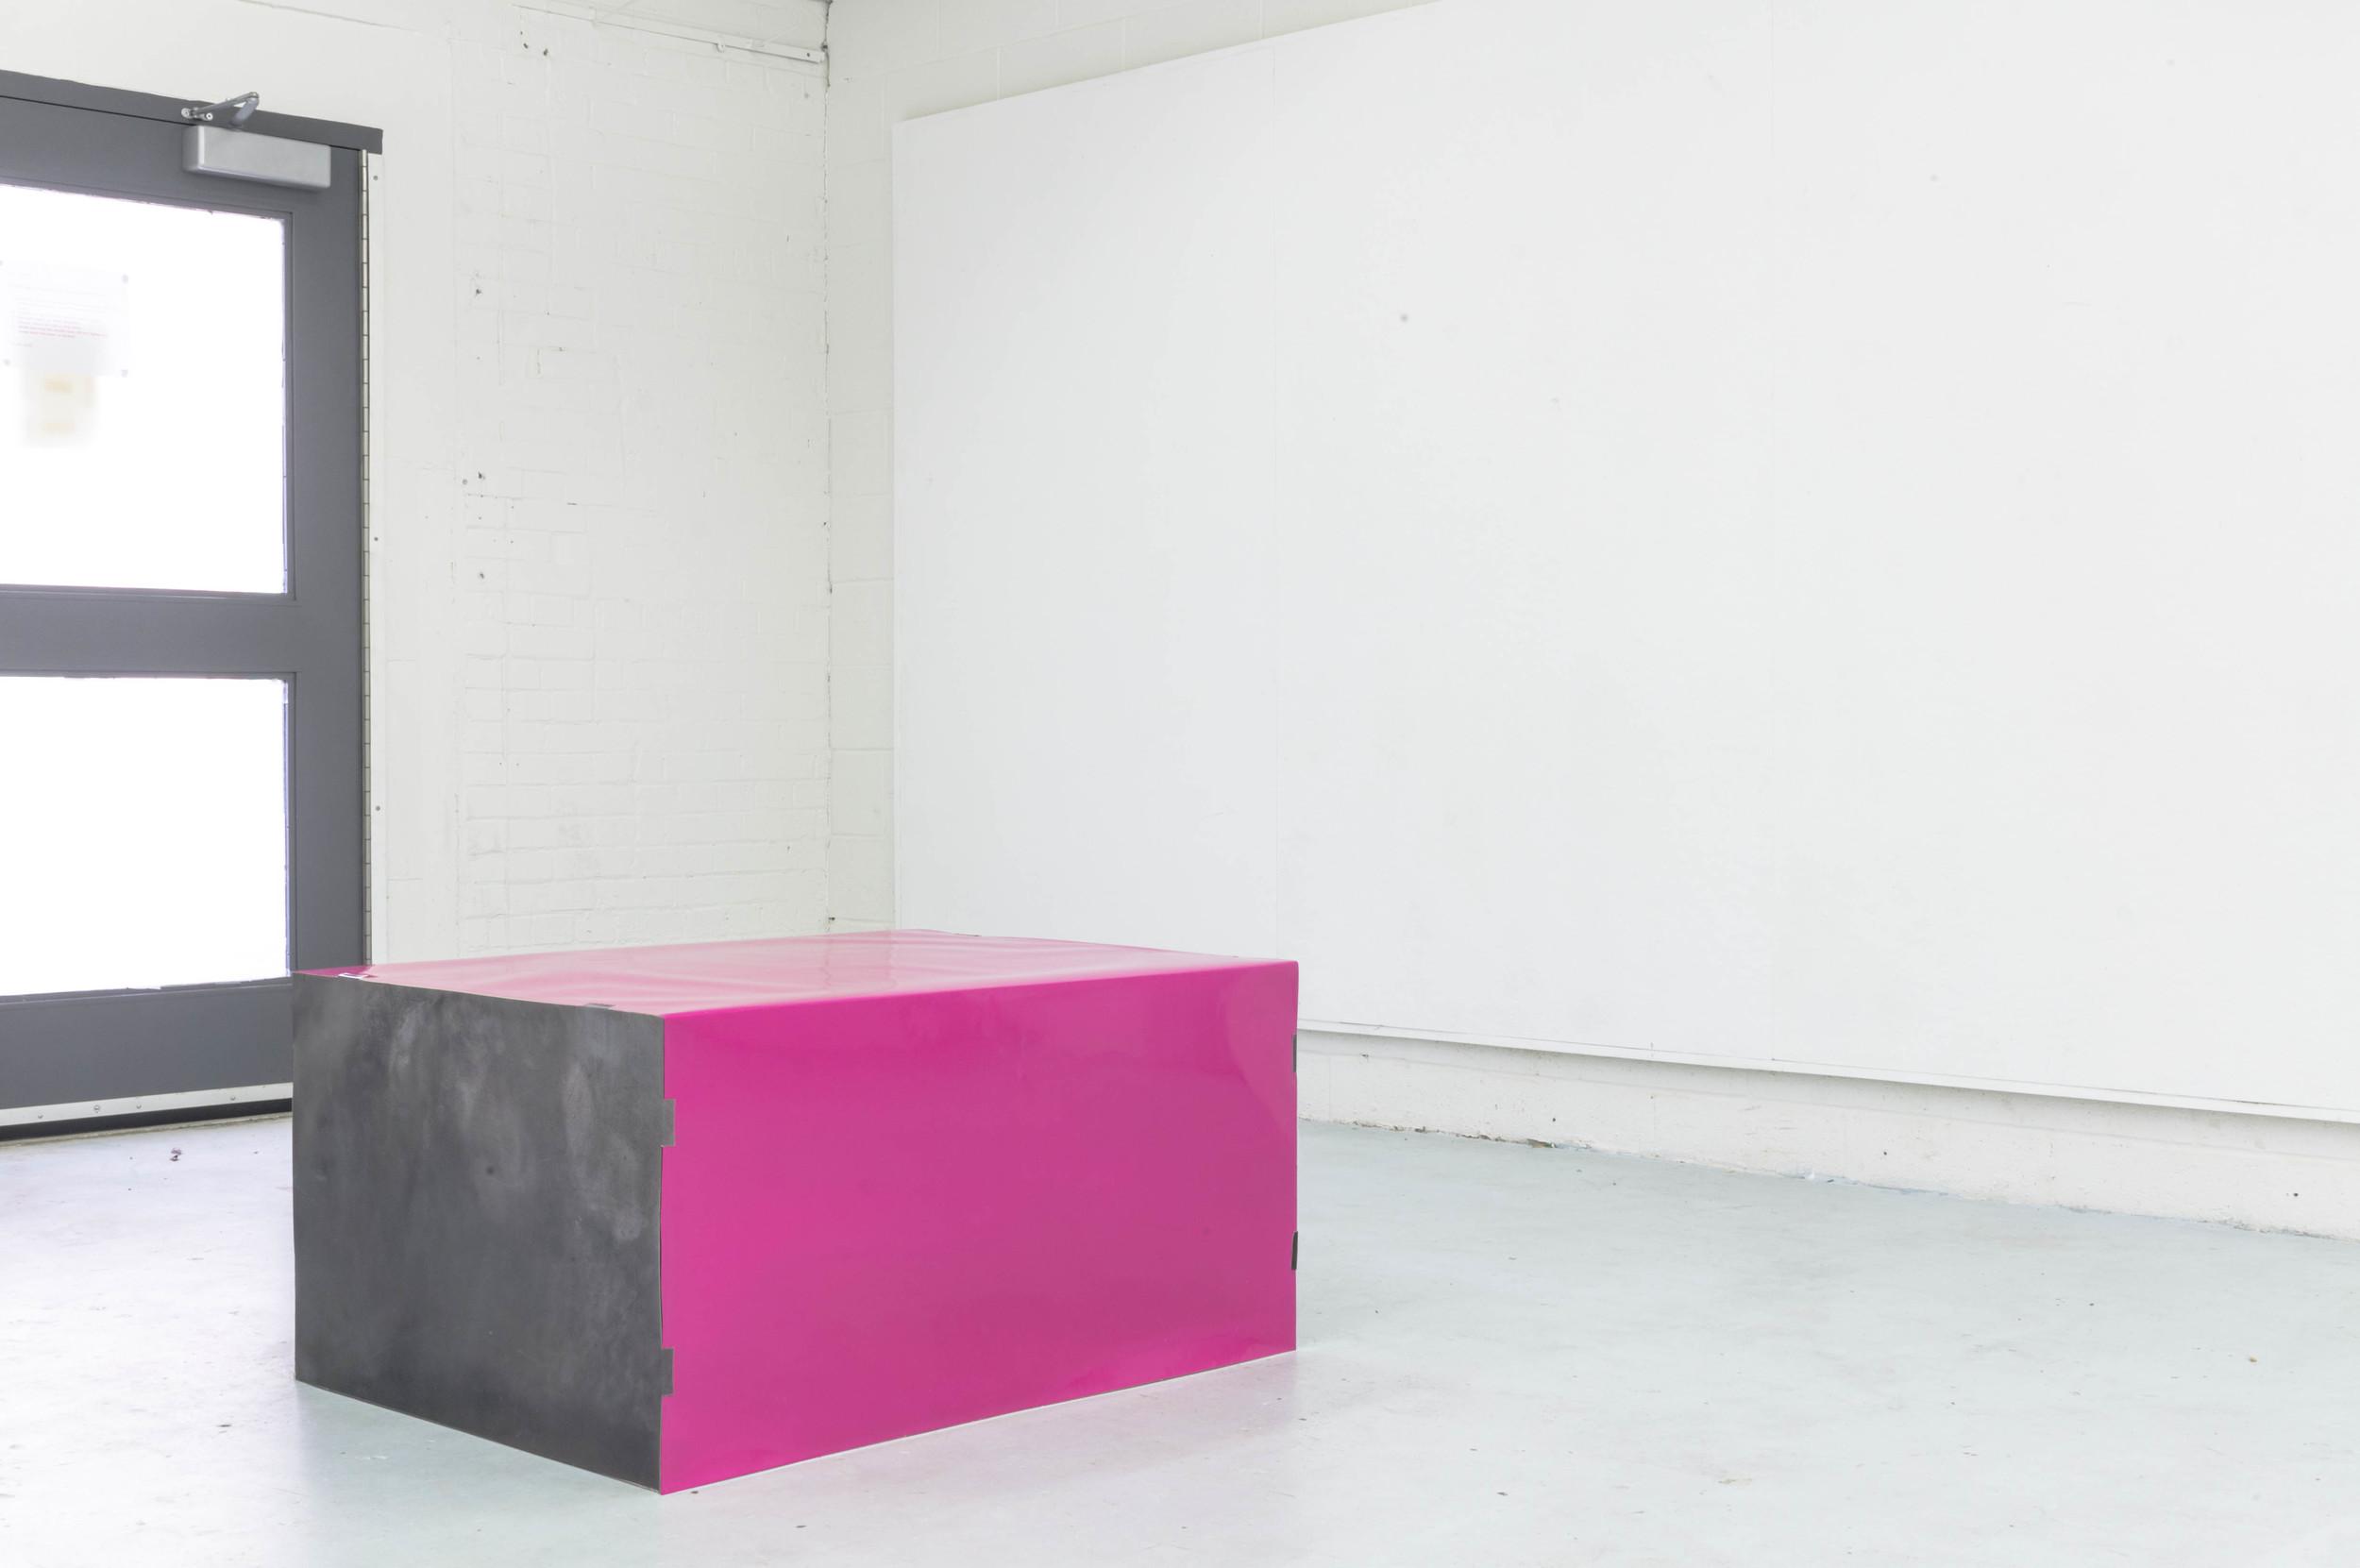 "Untitled (After Donald Judd)  2014 20x30x40"" C-Prints, Foam Core"